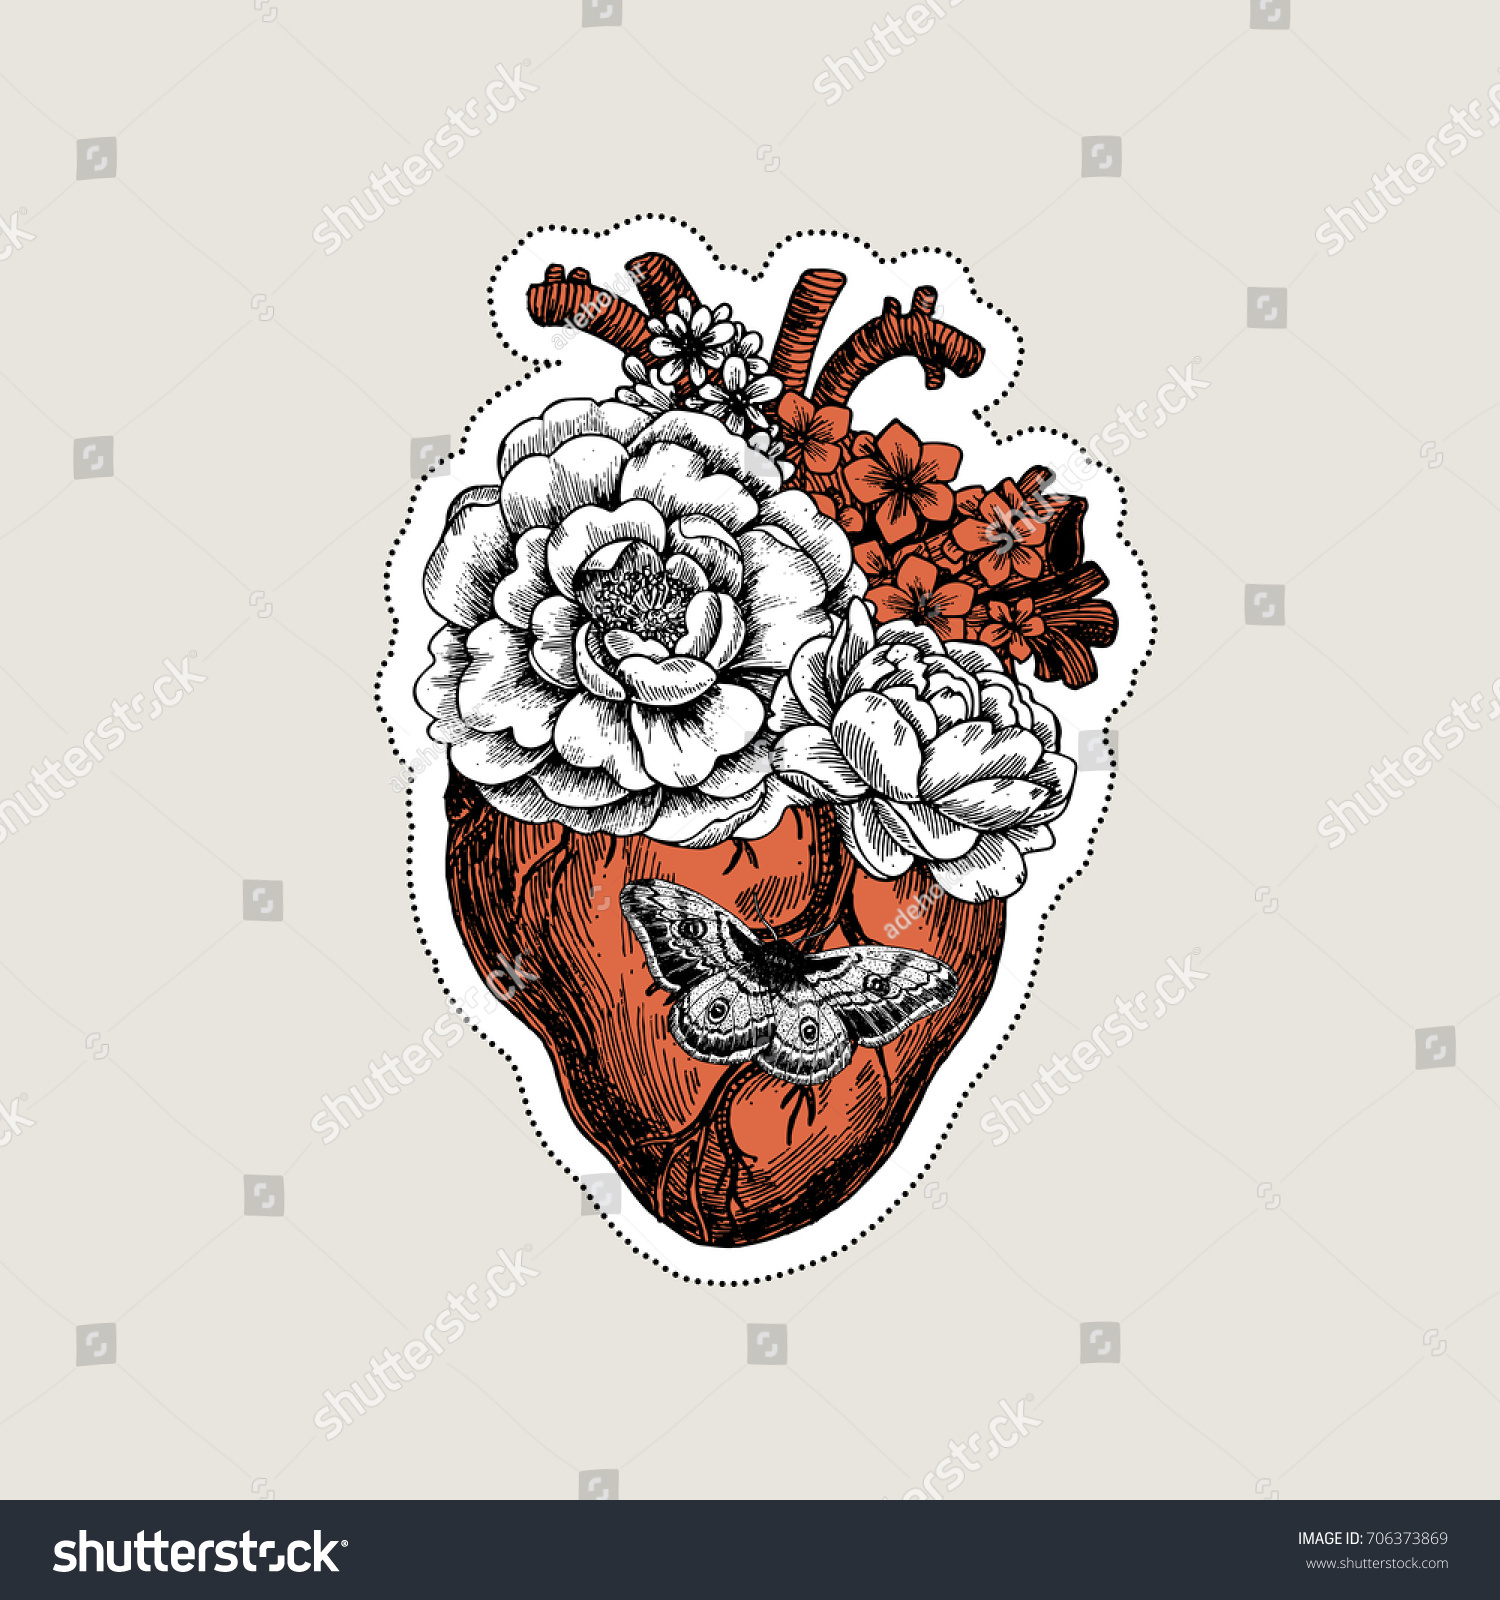 Tattoo Anatomy Vintage Illustration Floral Anatomical Stock Vector ...